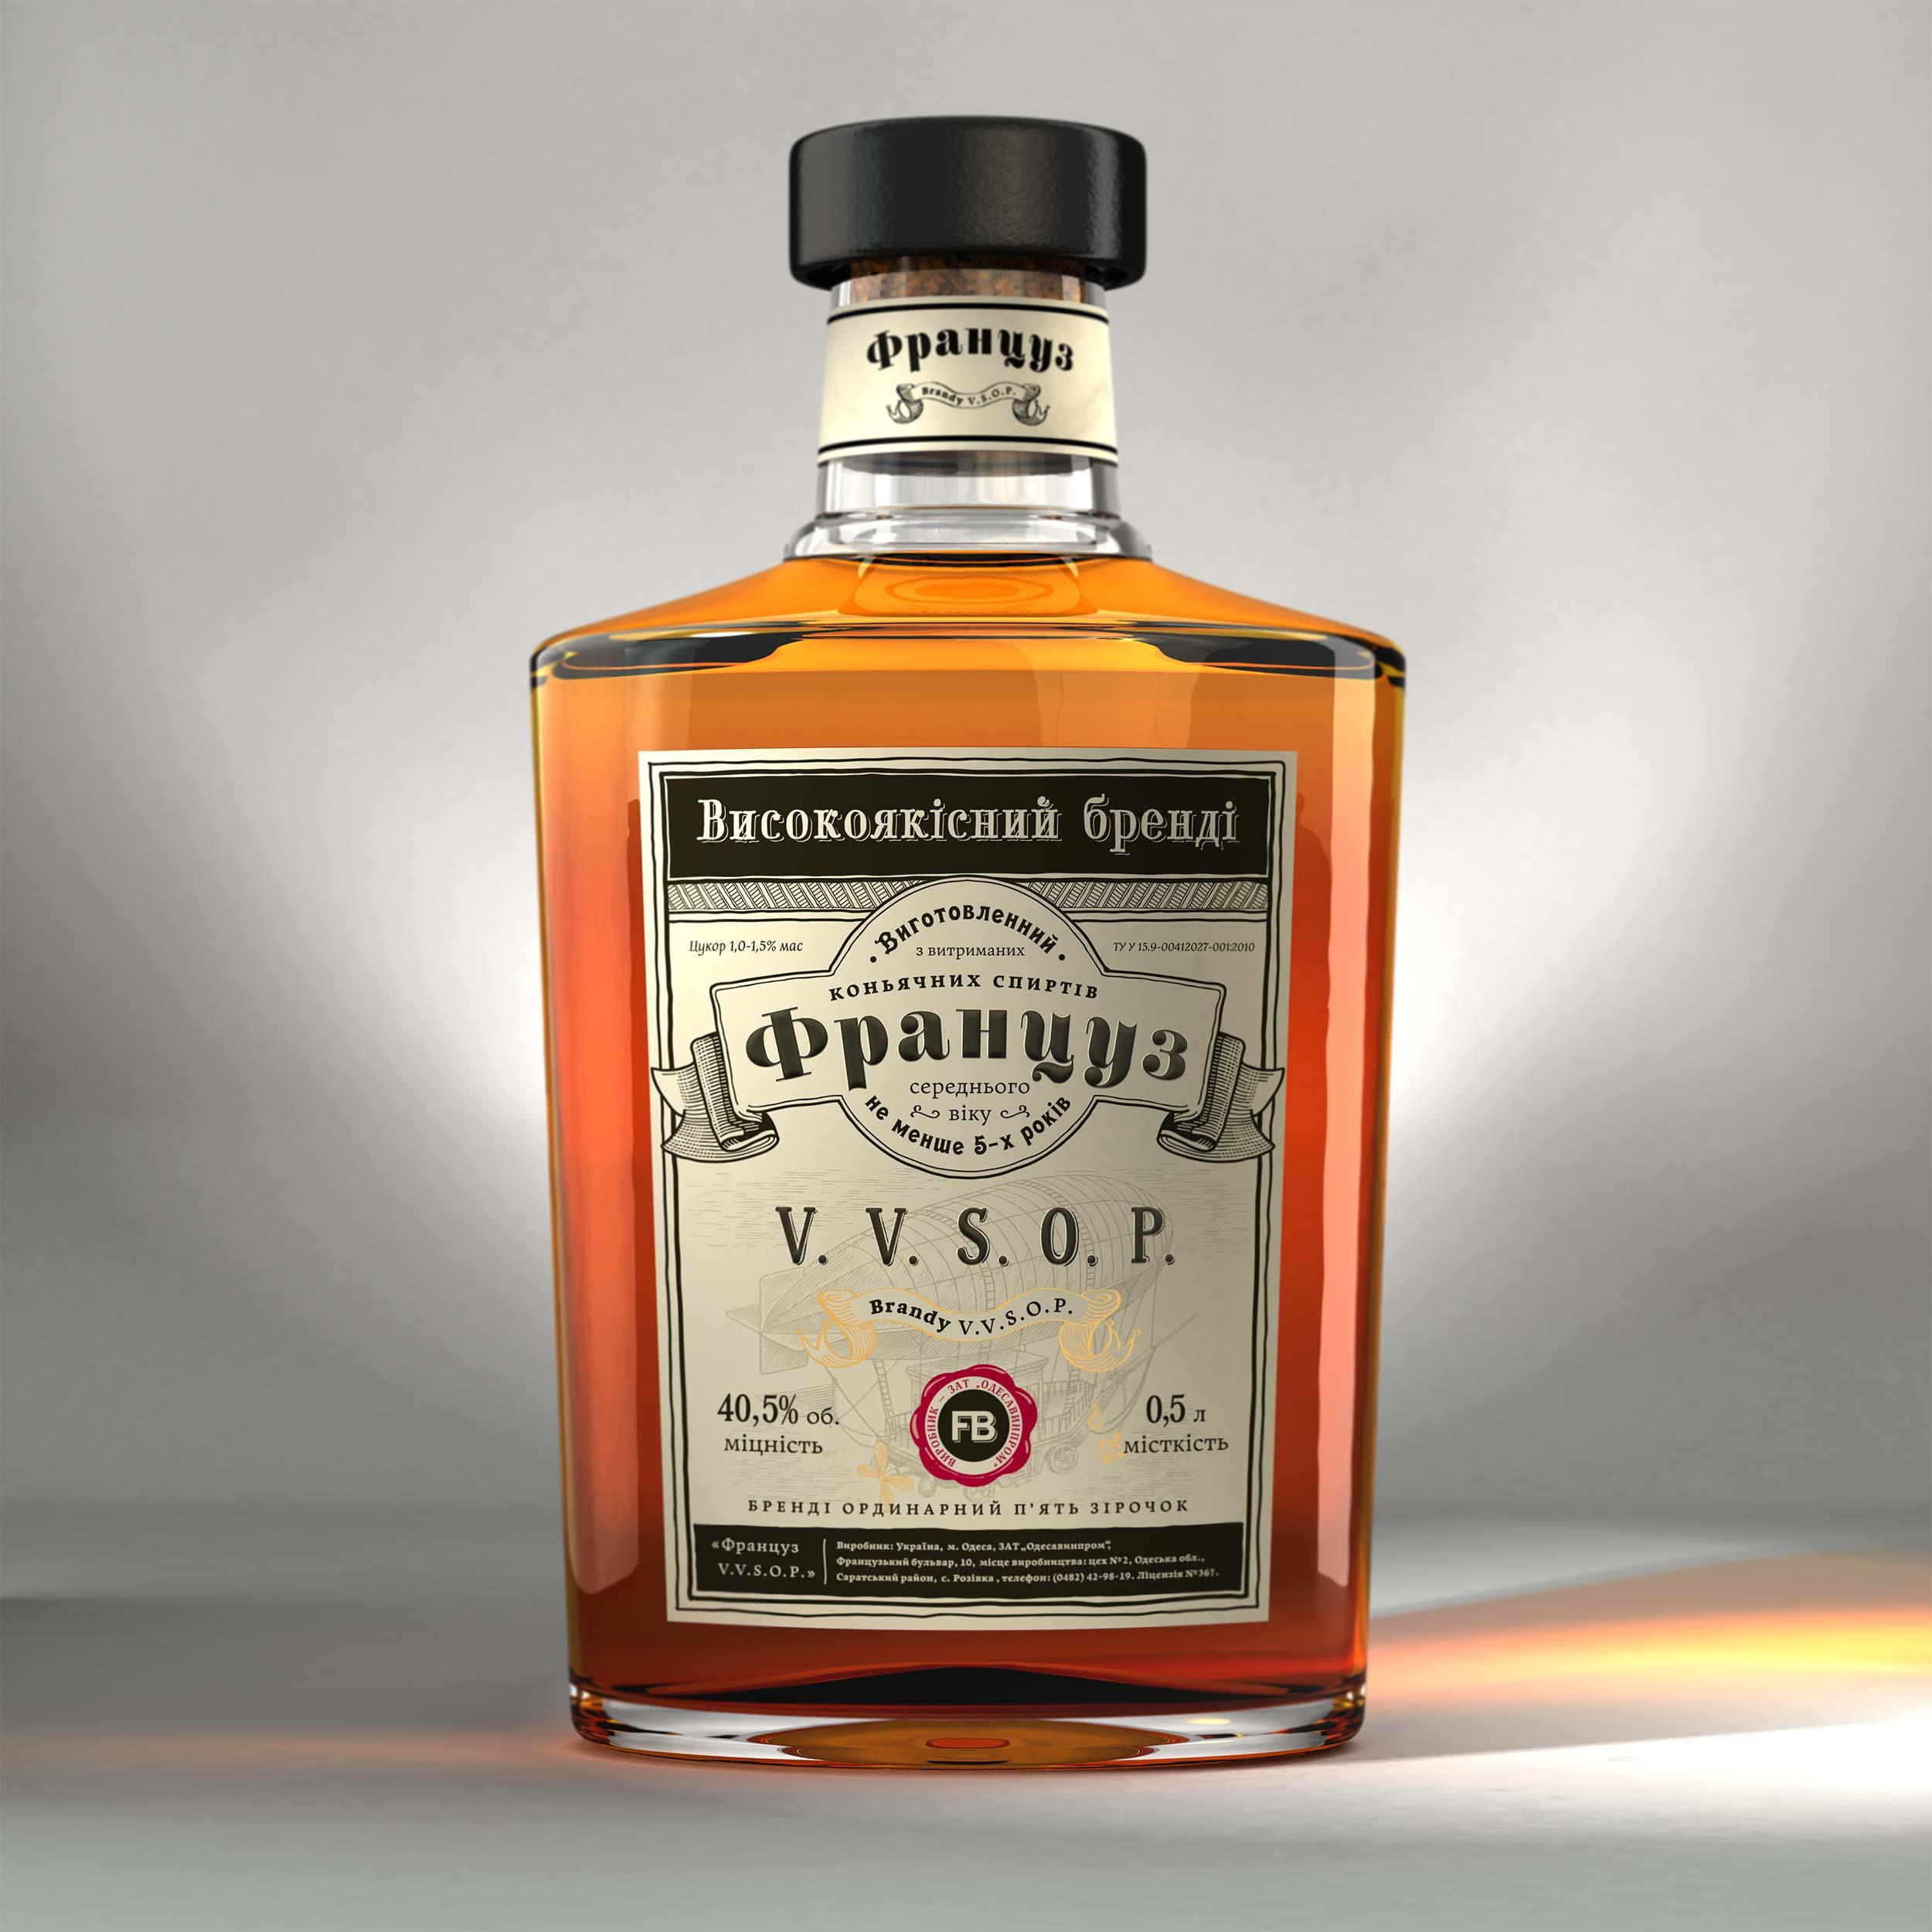 3d-liquor-bottle-by-astorza